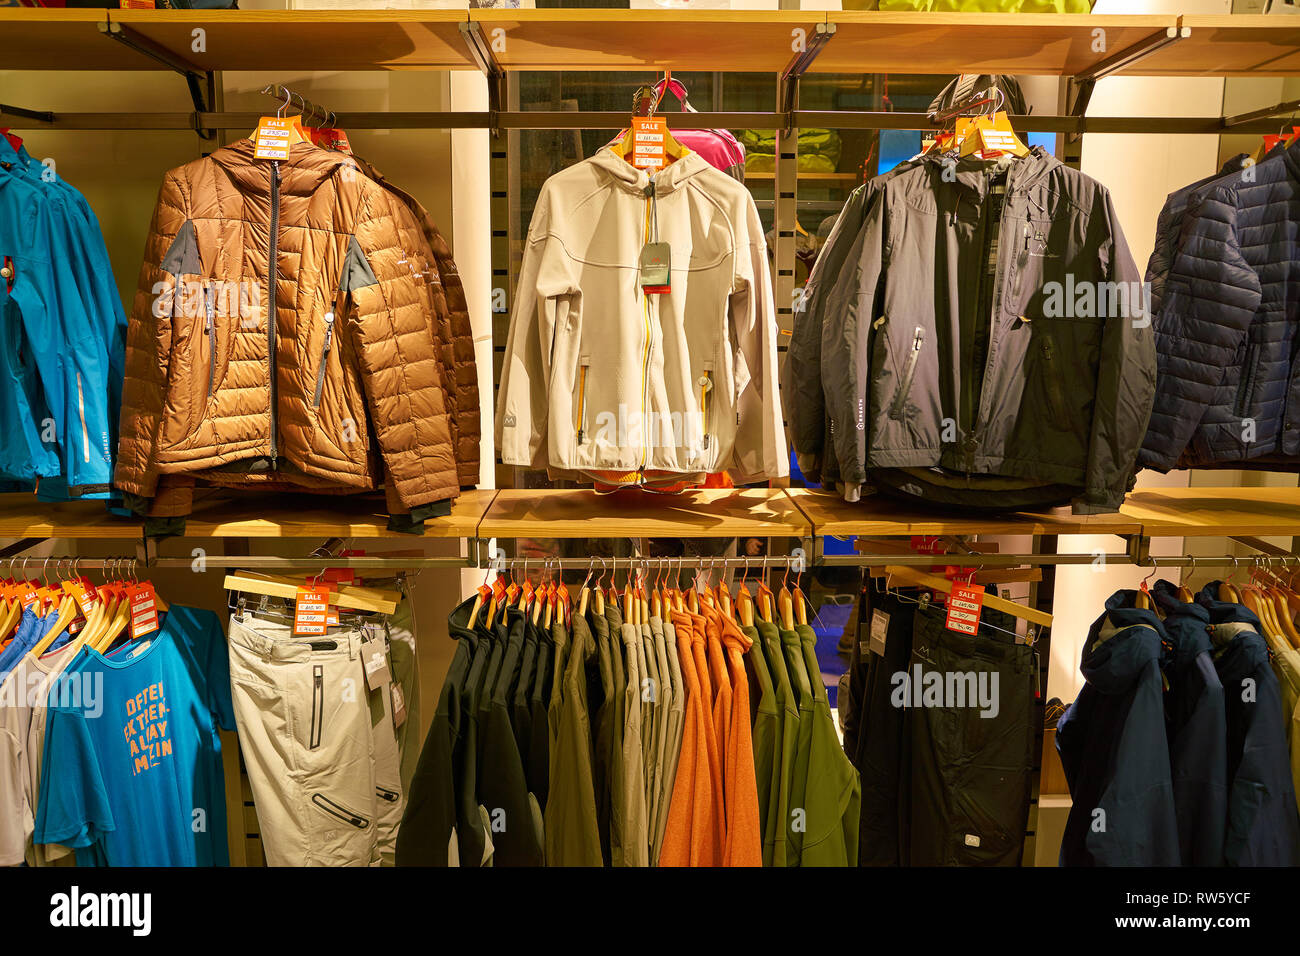 ROME, ITALY - CIRCA NOVEMBER, 2017: interior shot of a store in Rome. - Stock Image